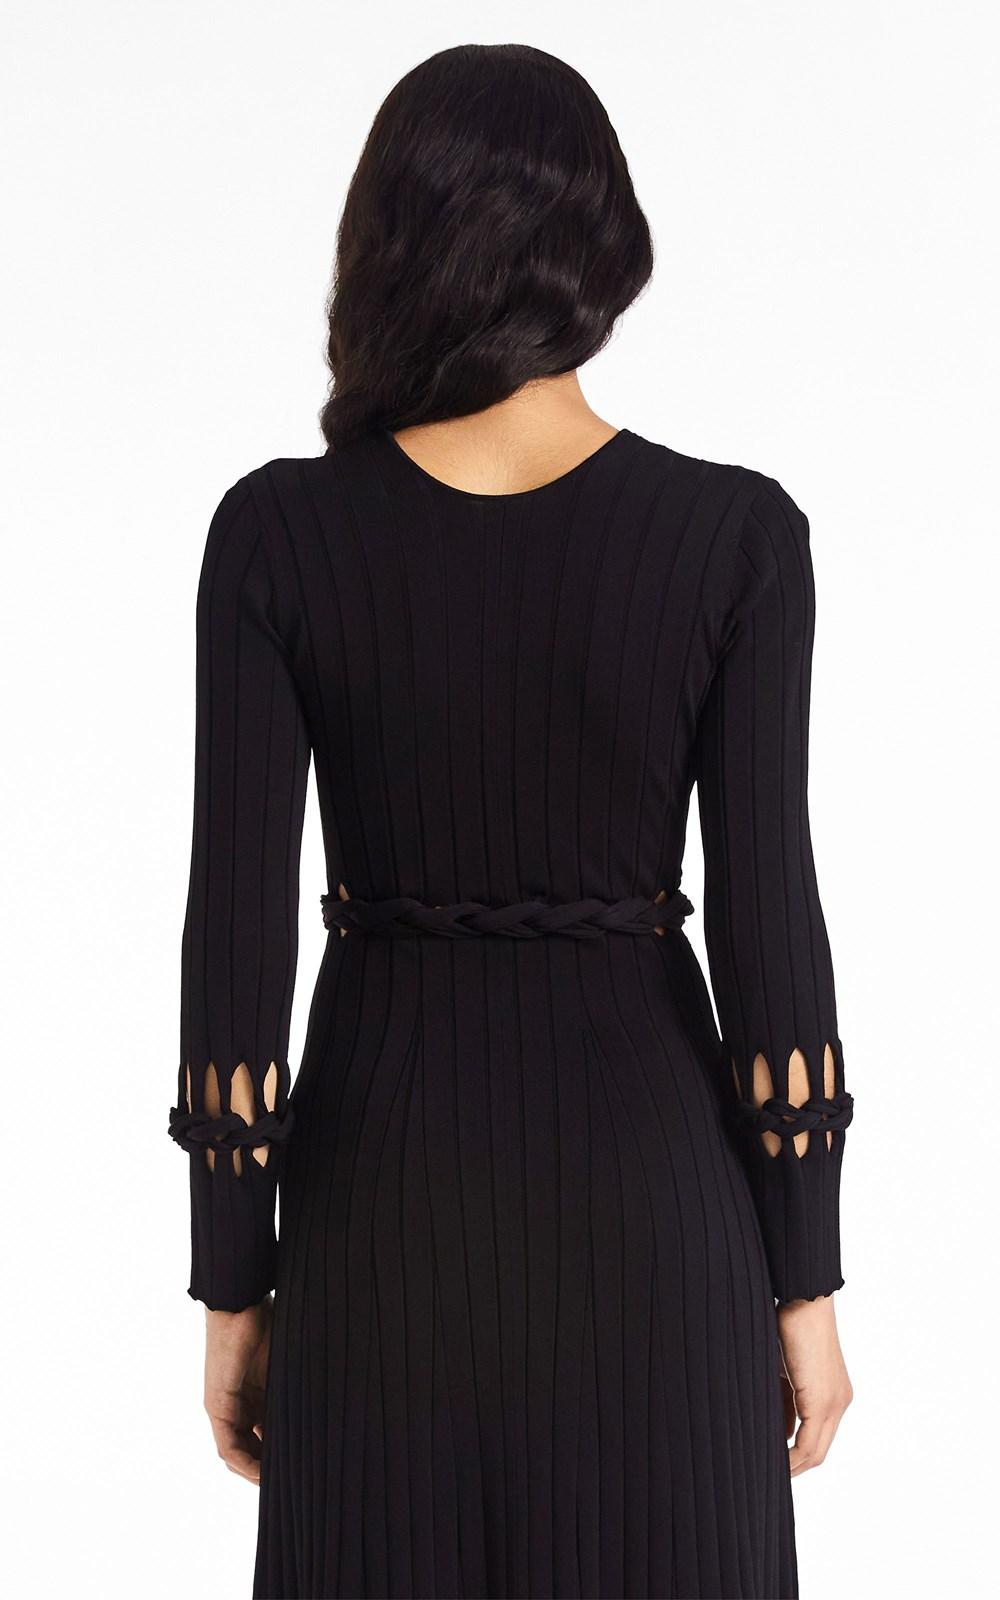 Dresses | BRAID LS DRESS